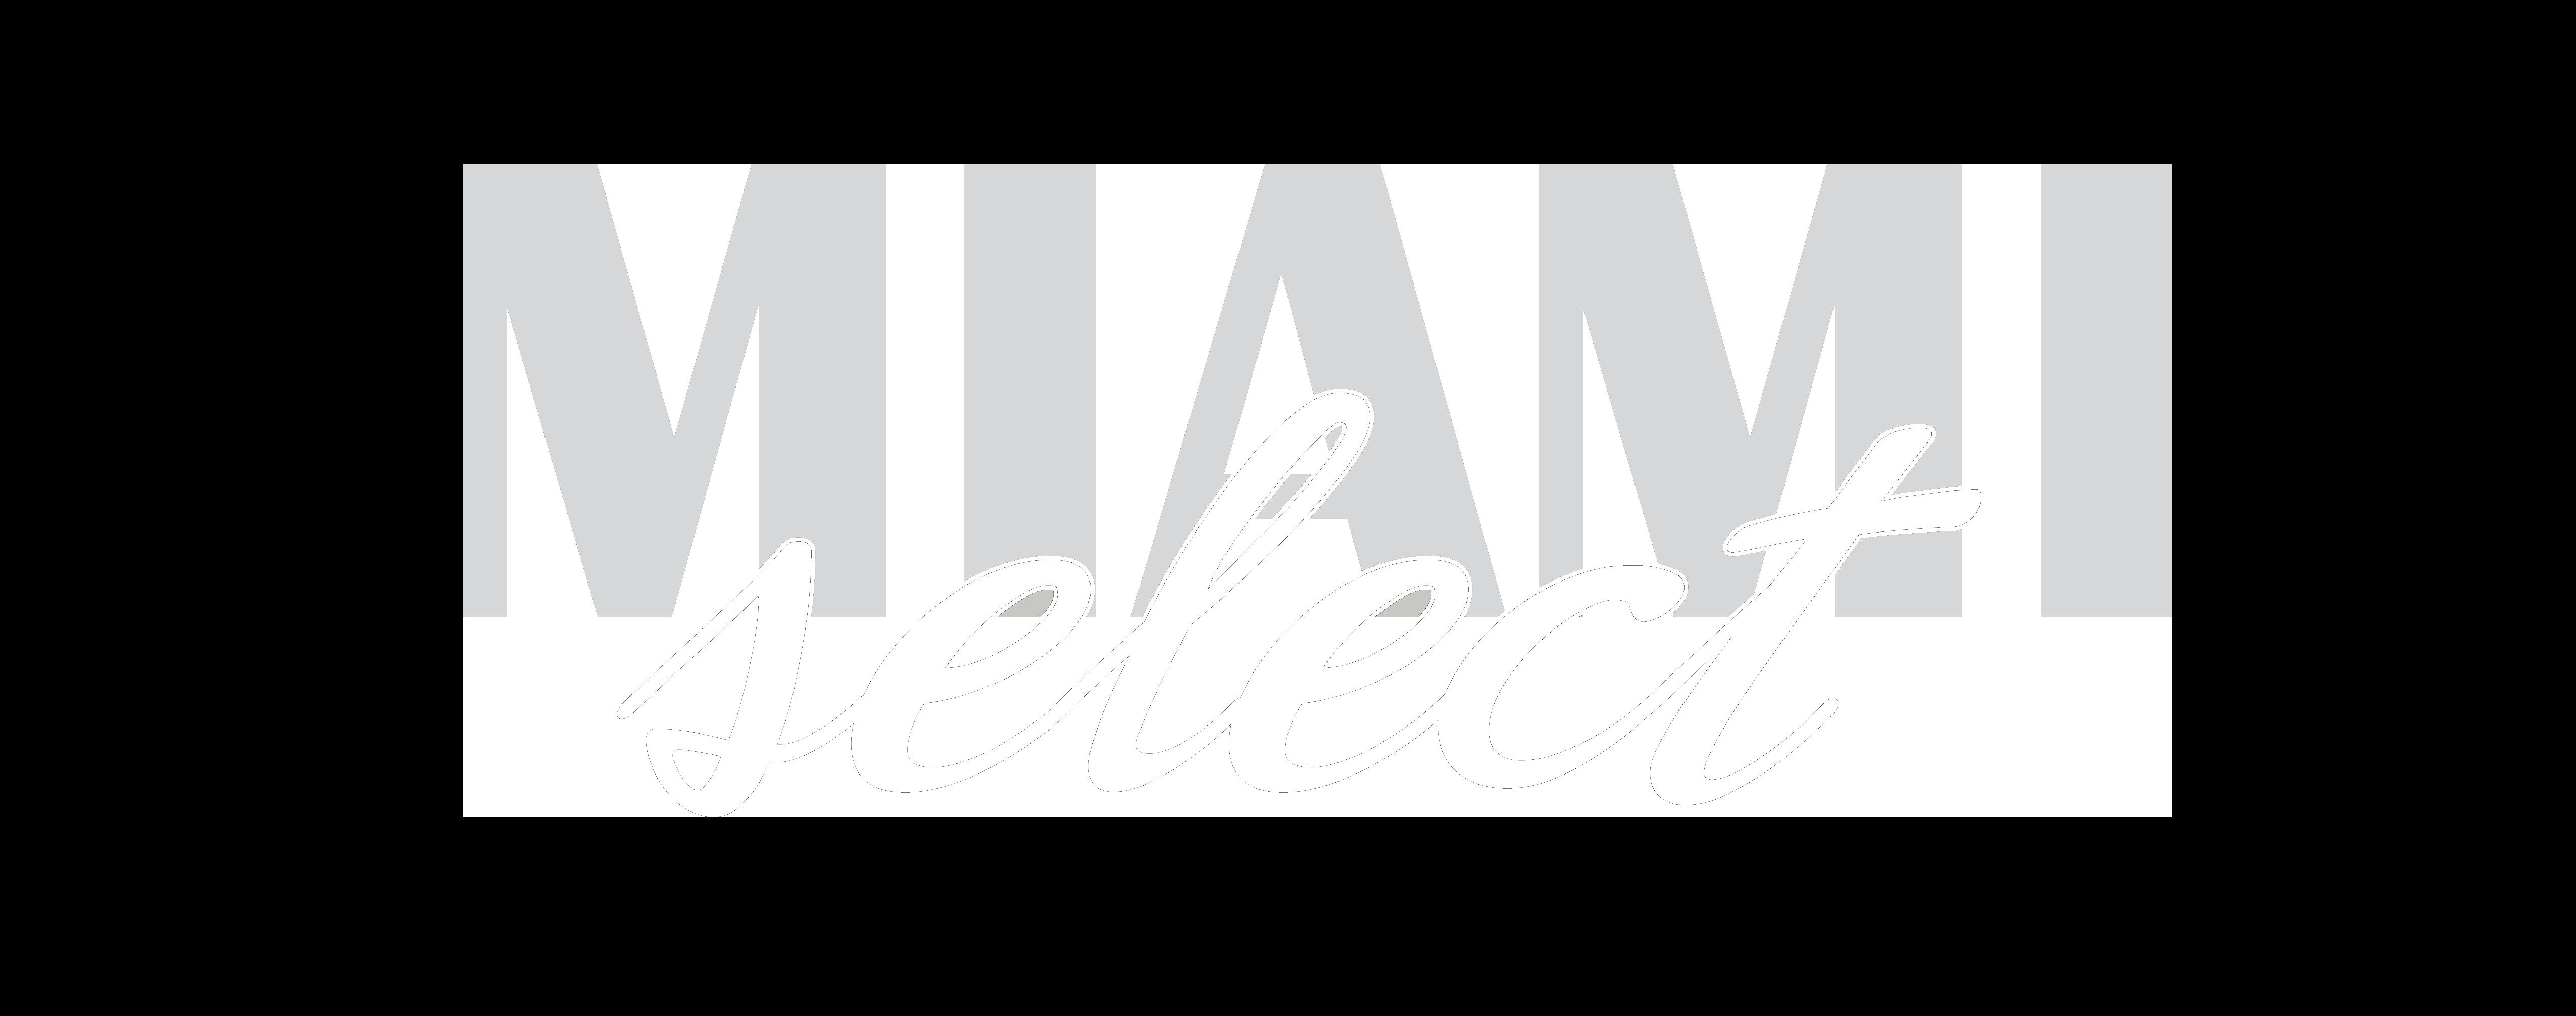 Miami select practice logos 3